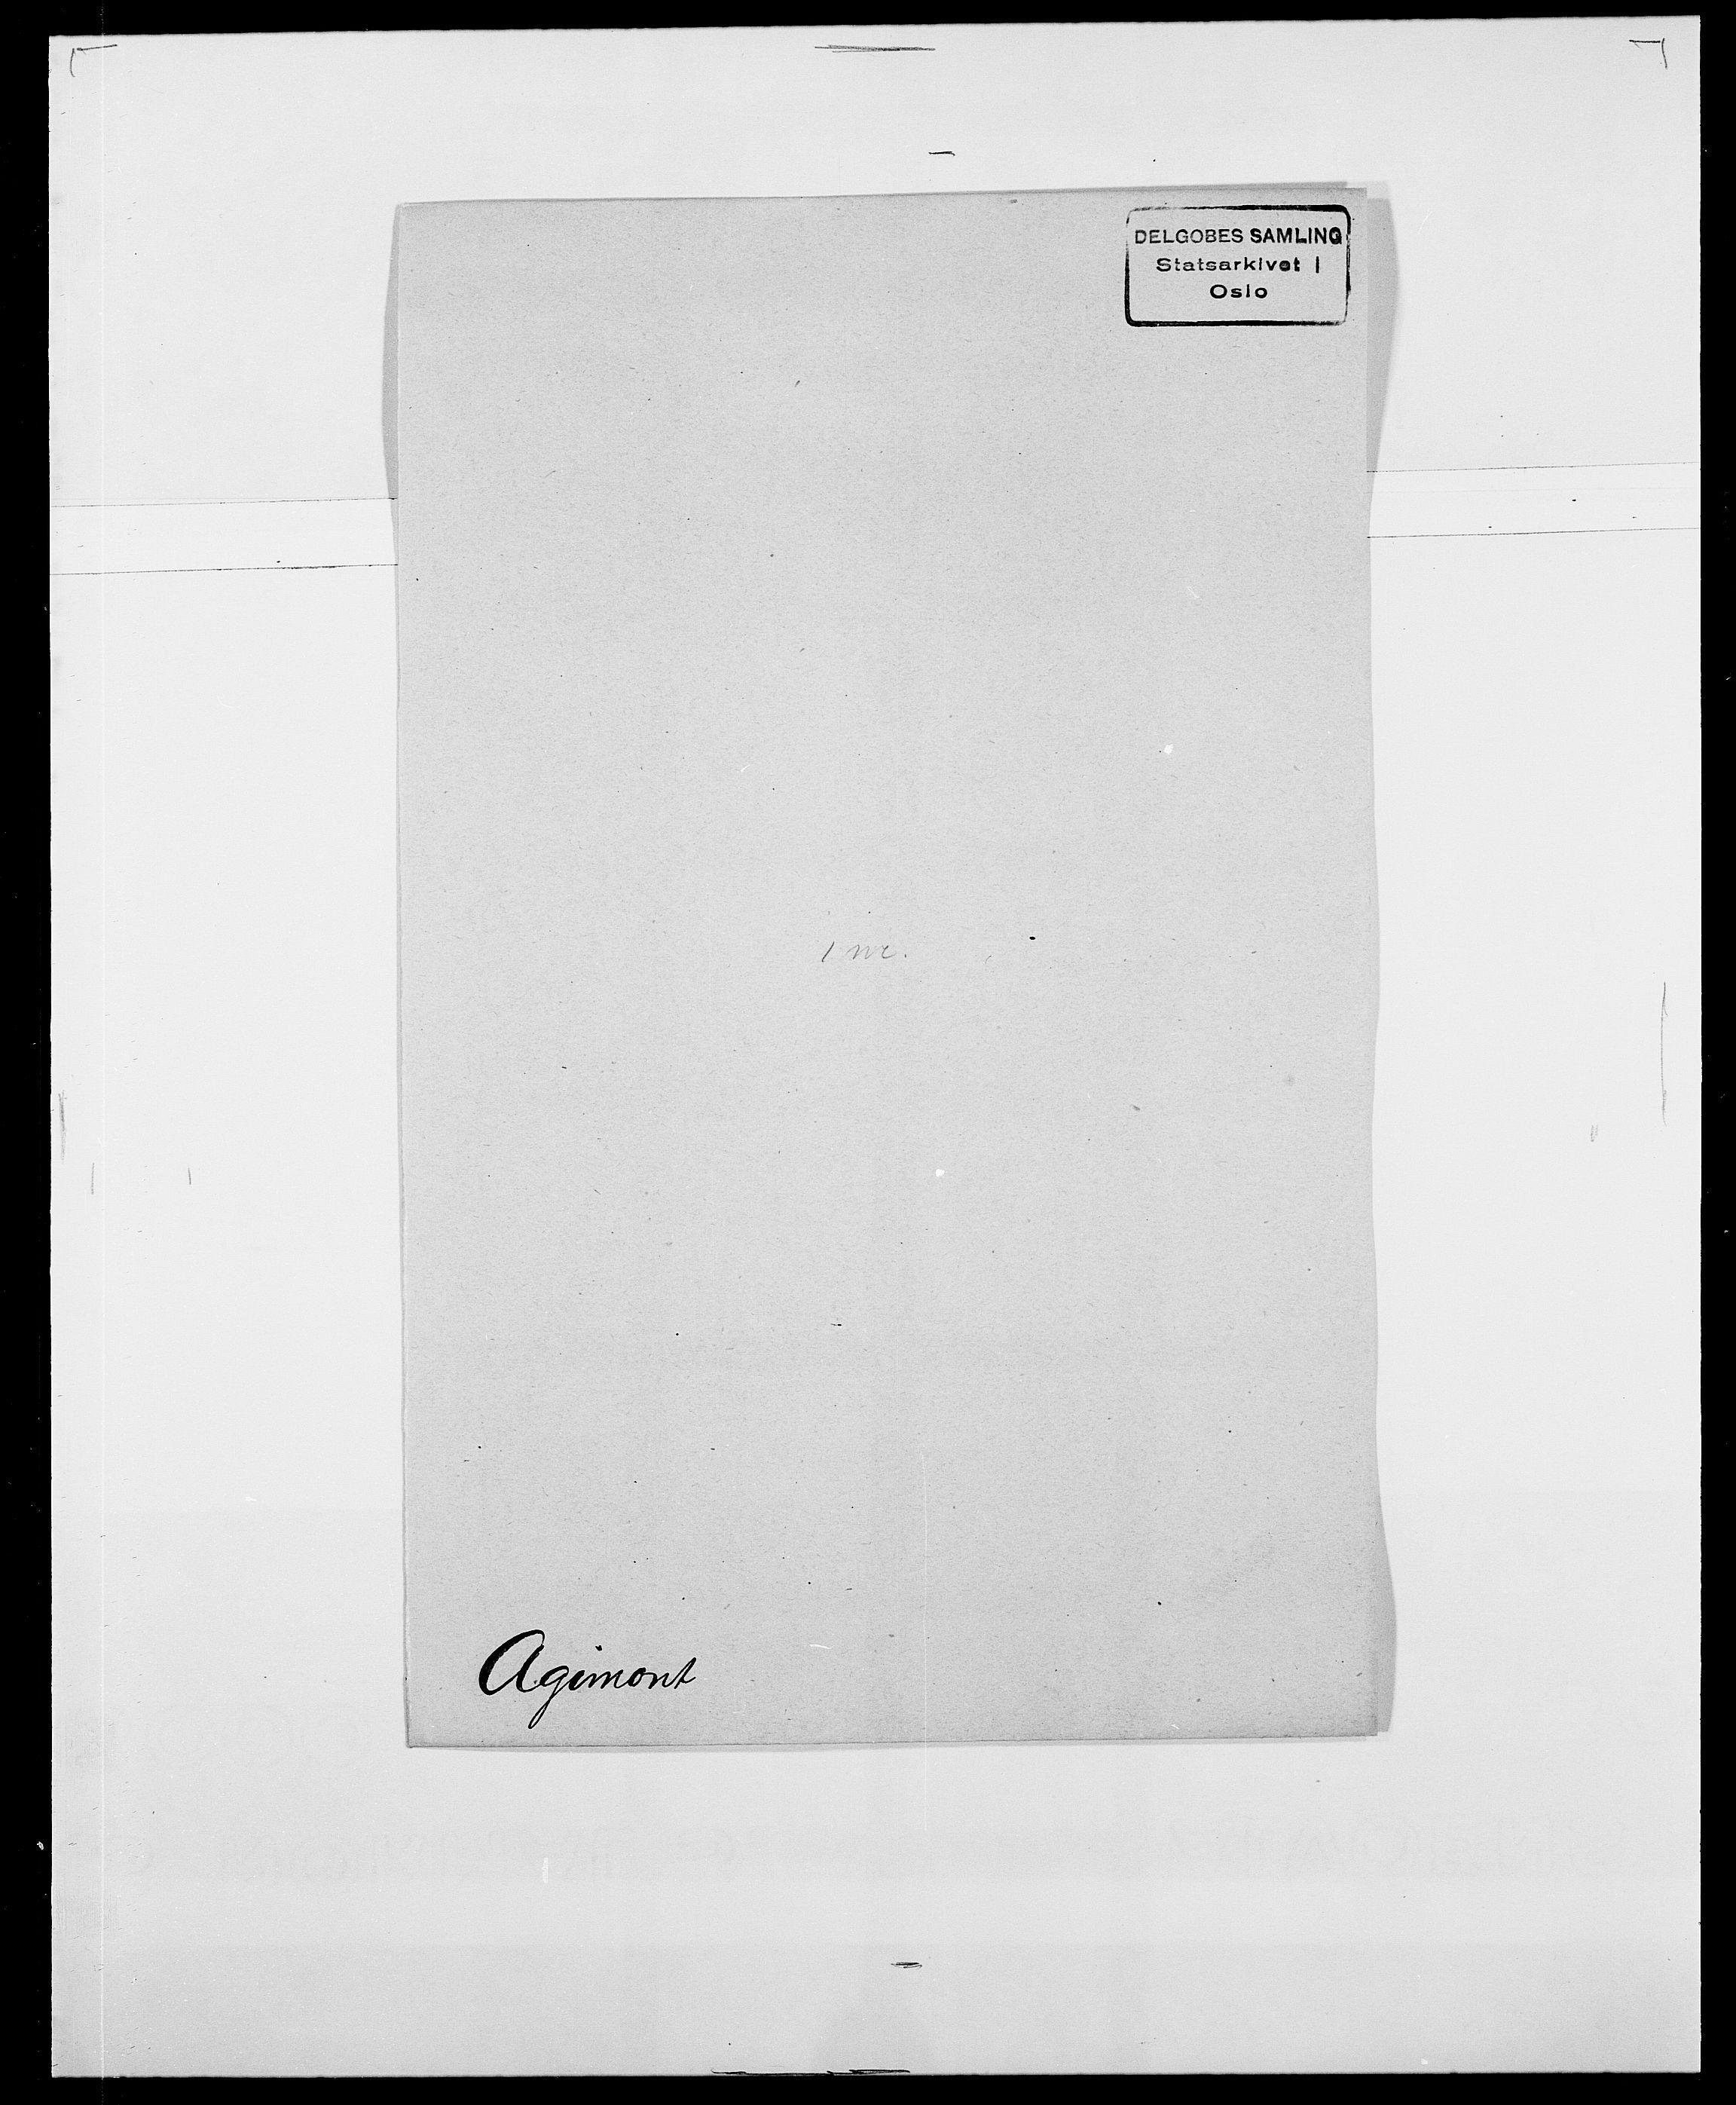 SAO, Delgobe, Charles Antoine - samling, D/Da/L0001: Aabye - Angerman, s. 310